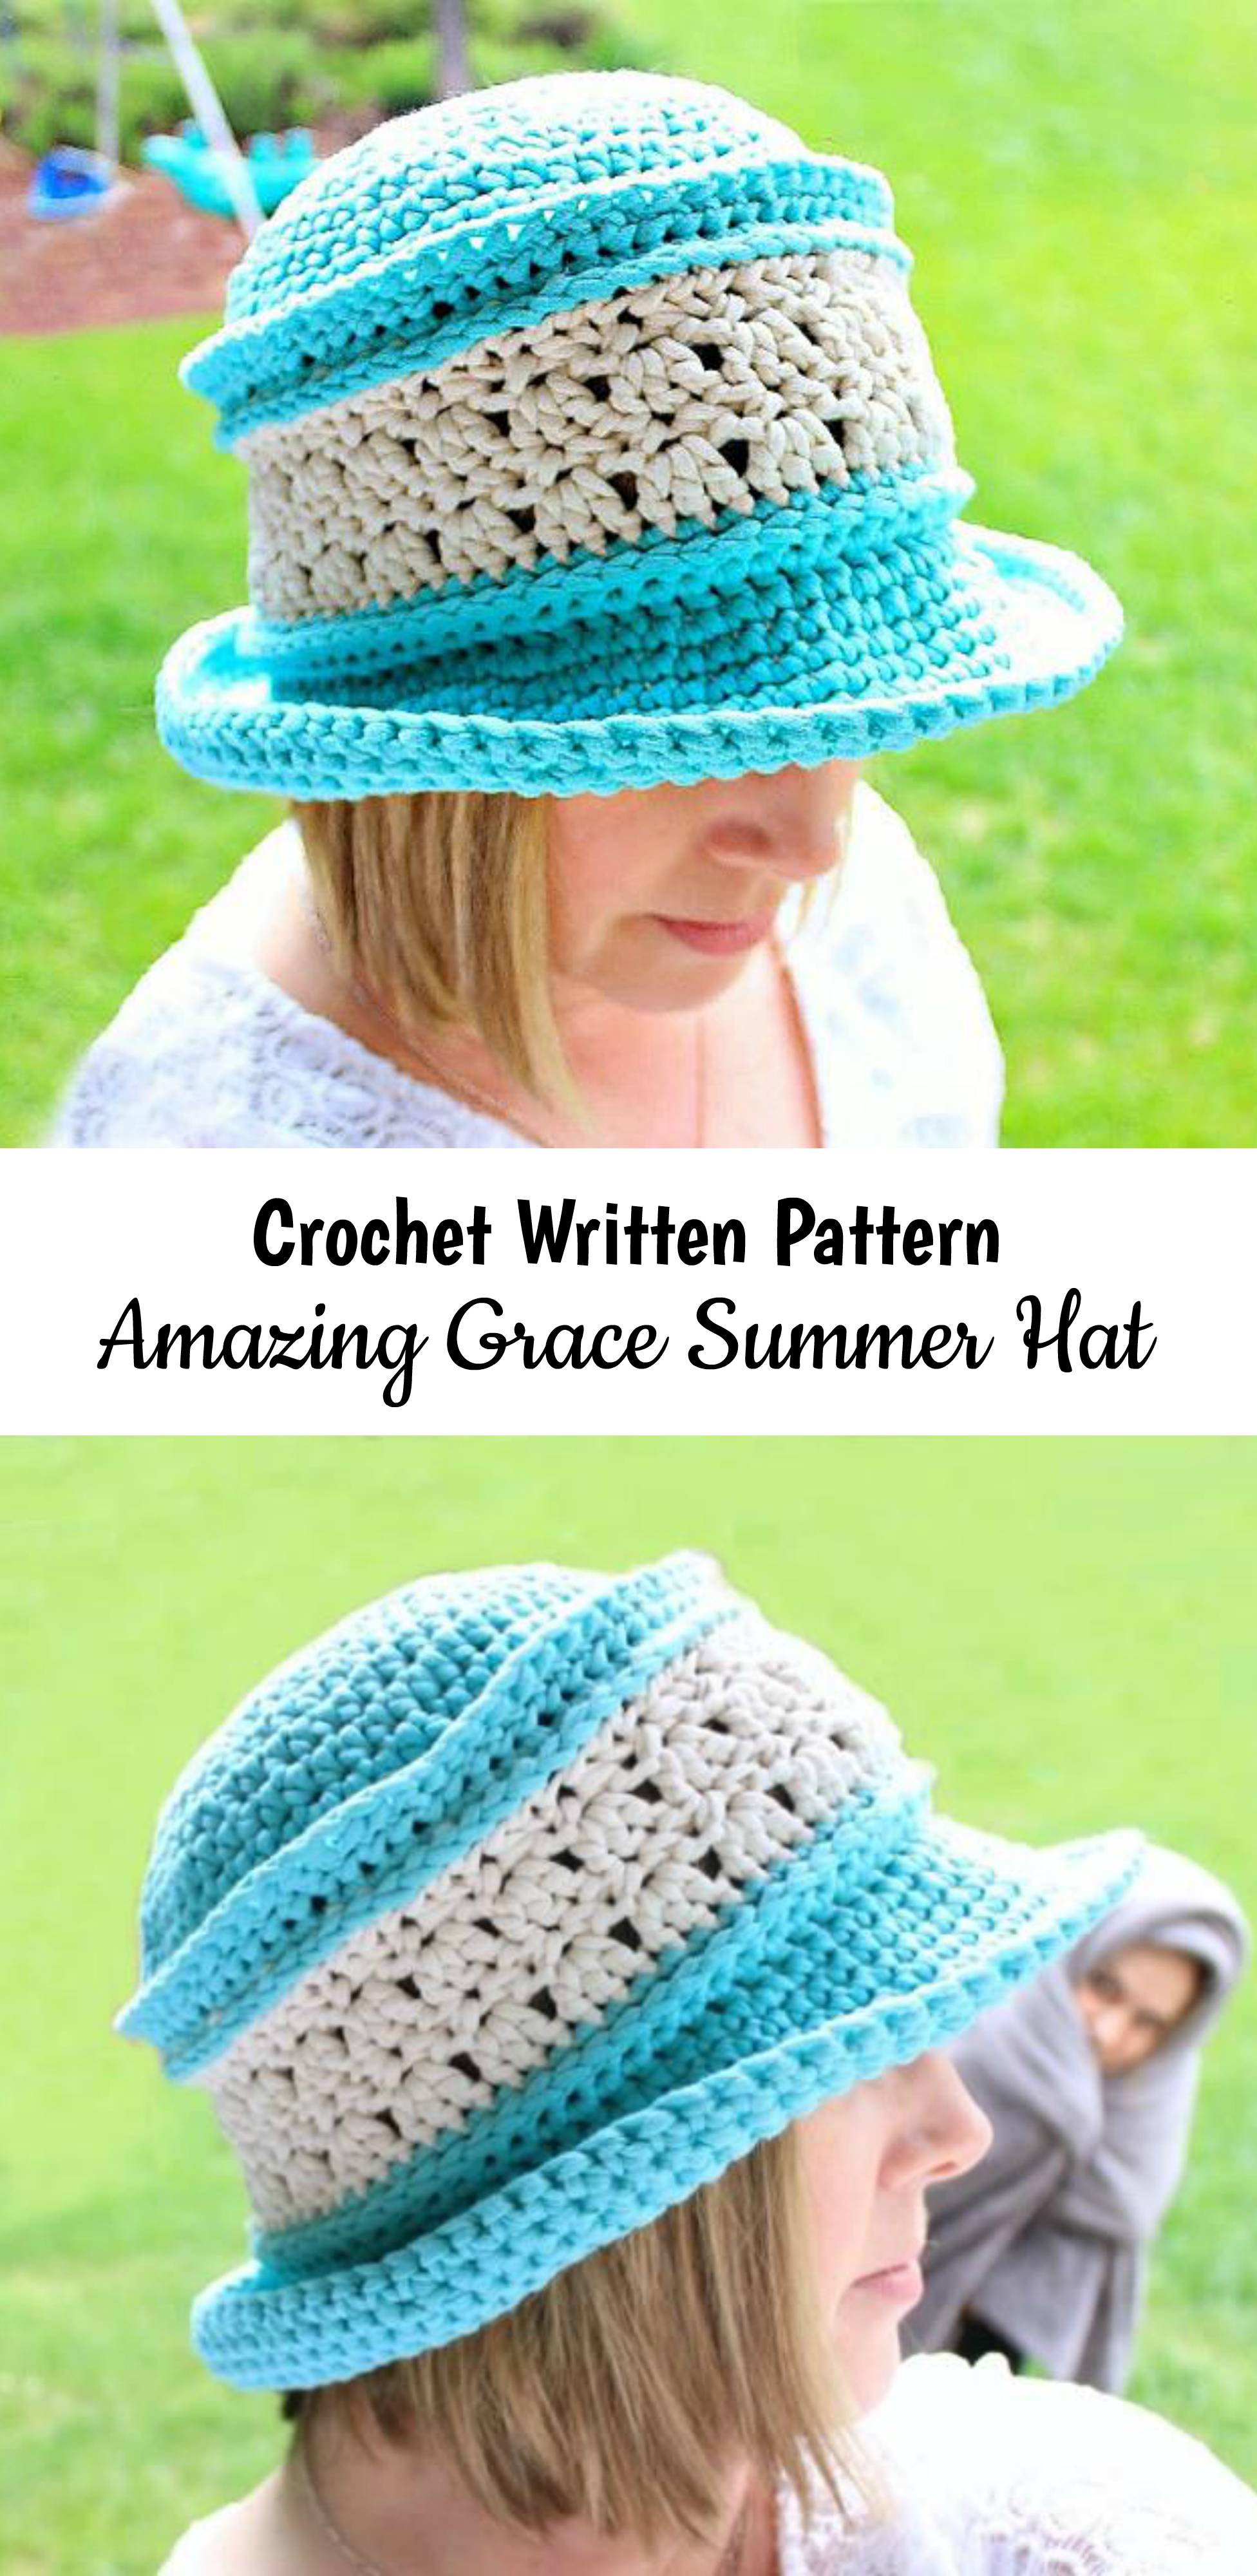 Crochet Amazing Grace Summer Hat